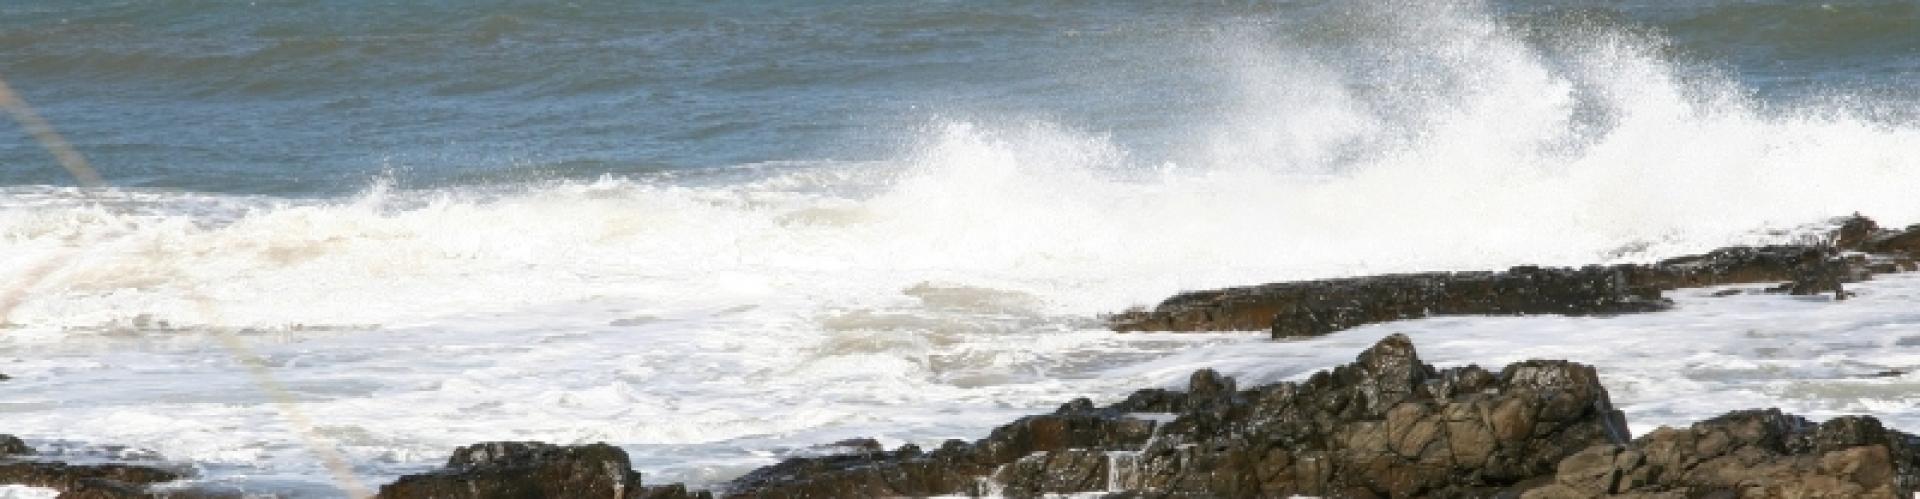 WIld Coast Beaches